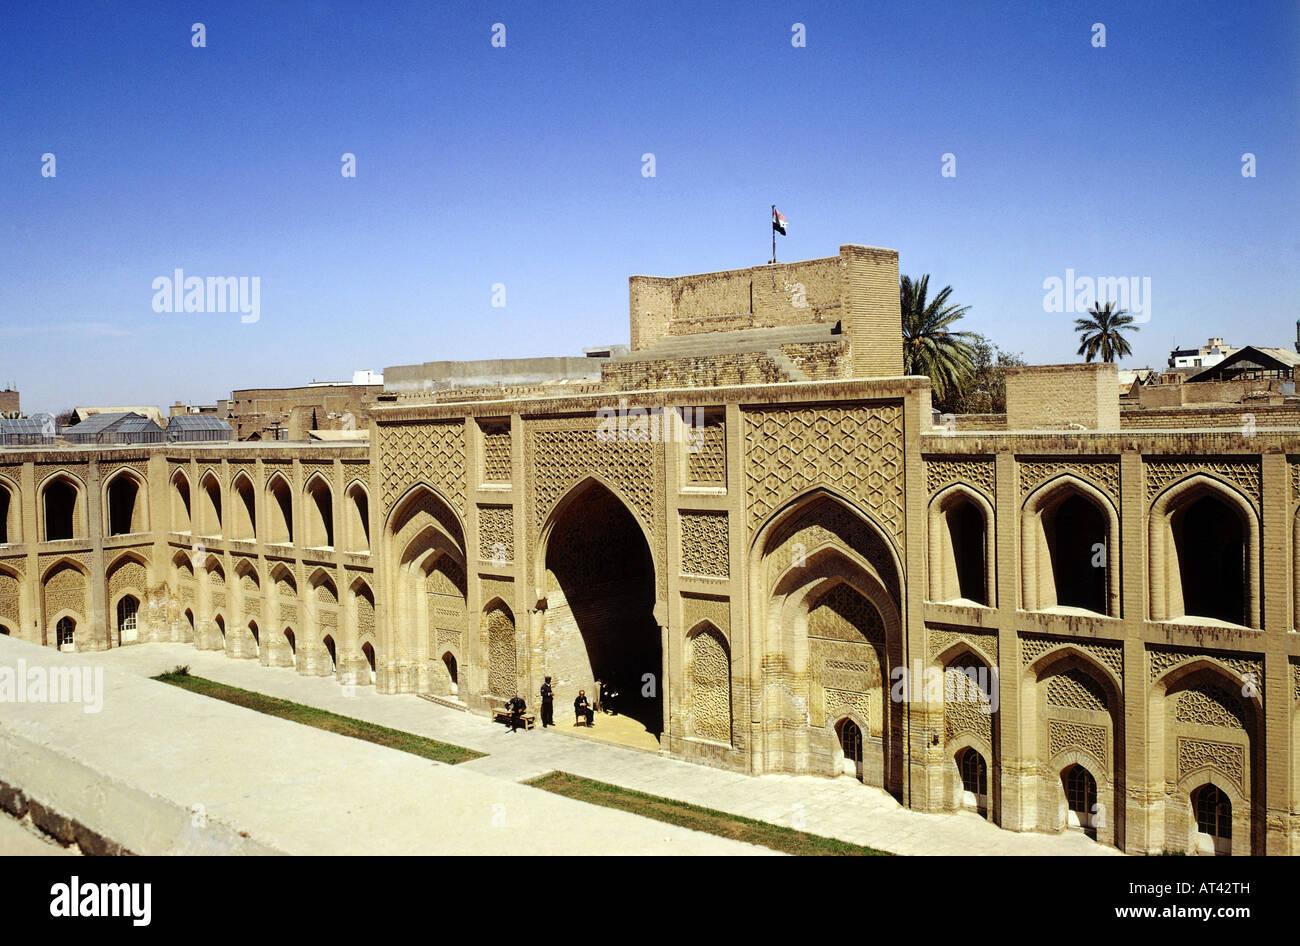 geography / travel, Iraq, Baghdad, buildings, architecture,  Mustansiriya university (Al-Madrasa-Al-Mustansiriya), Stock Photo